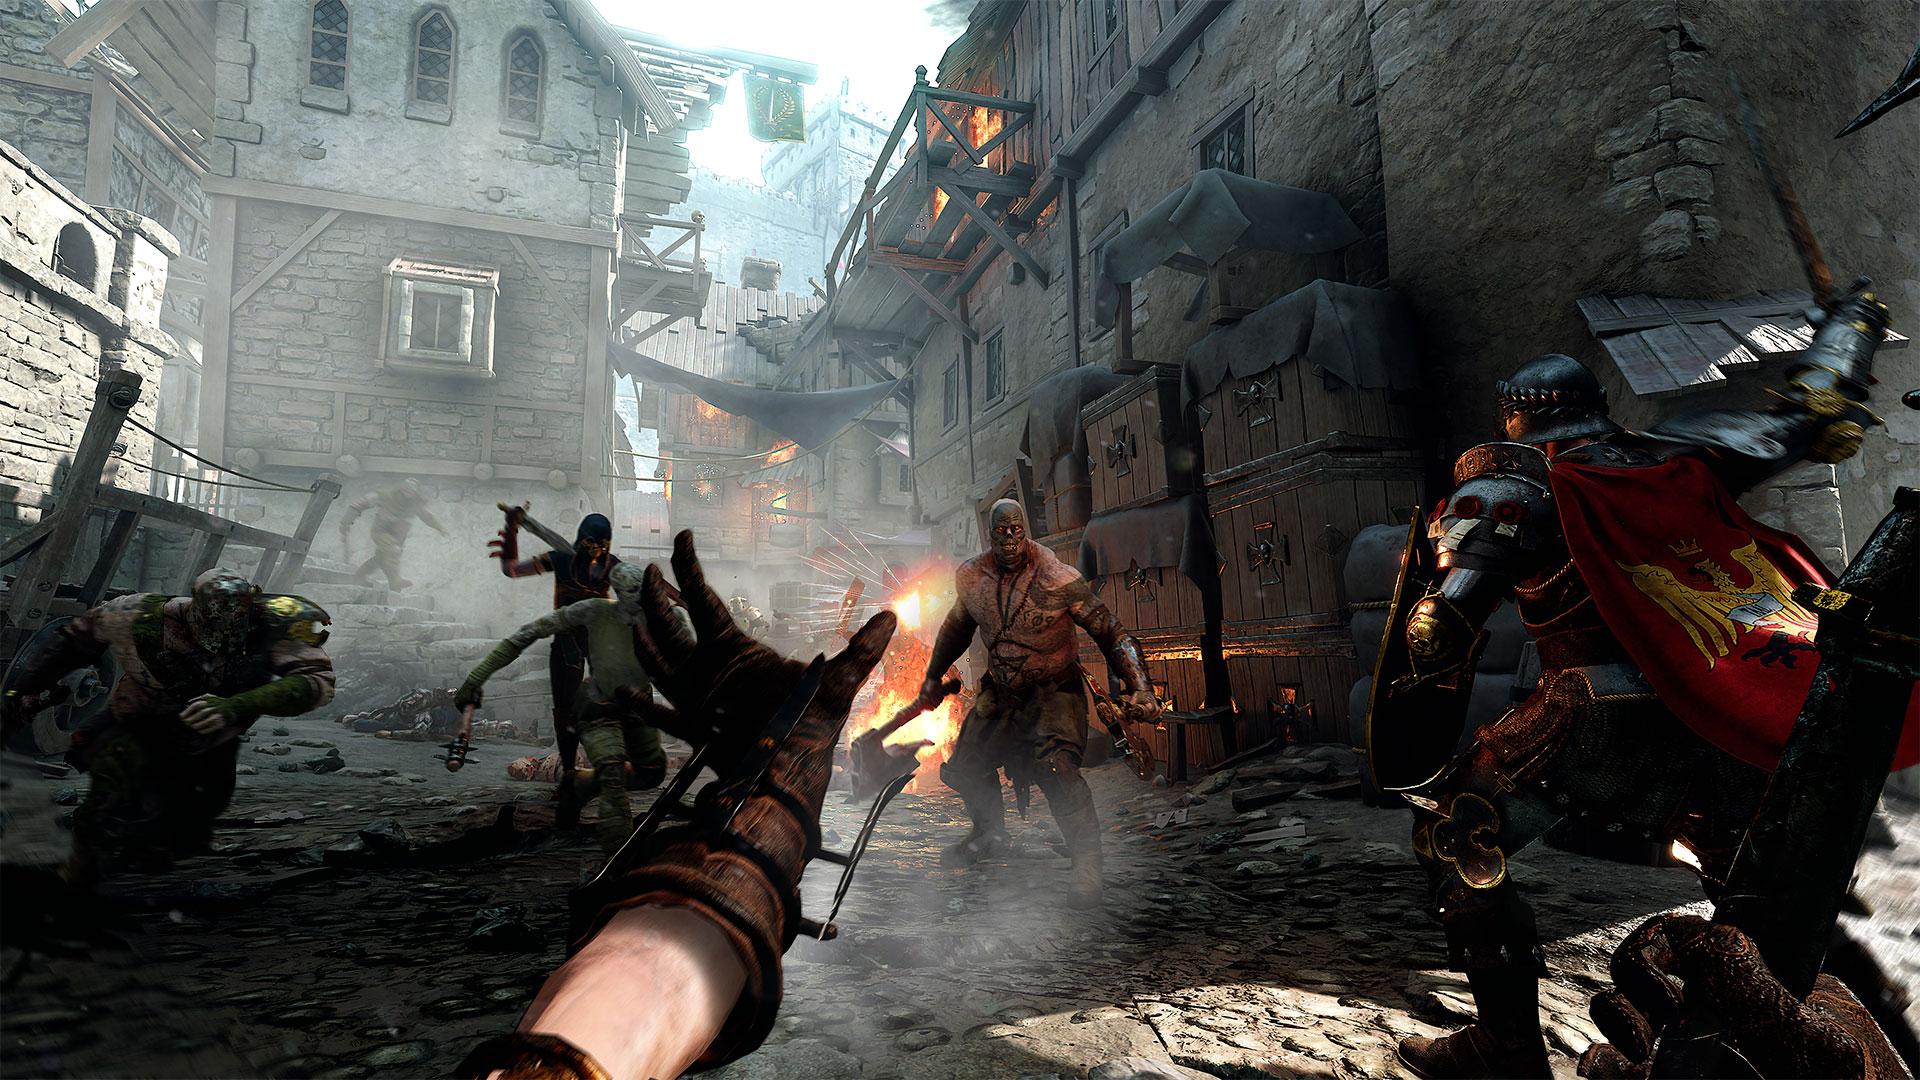 Скриншот №1 к Warhammer Vermintide 2 — комплект максимального издания